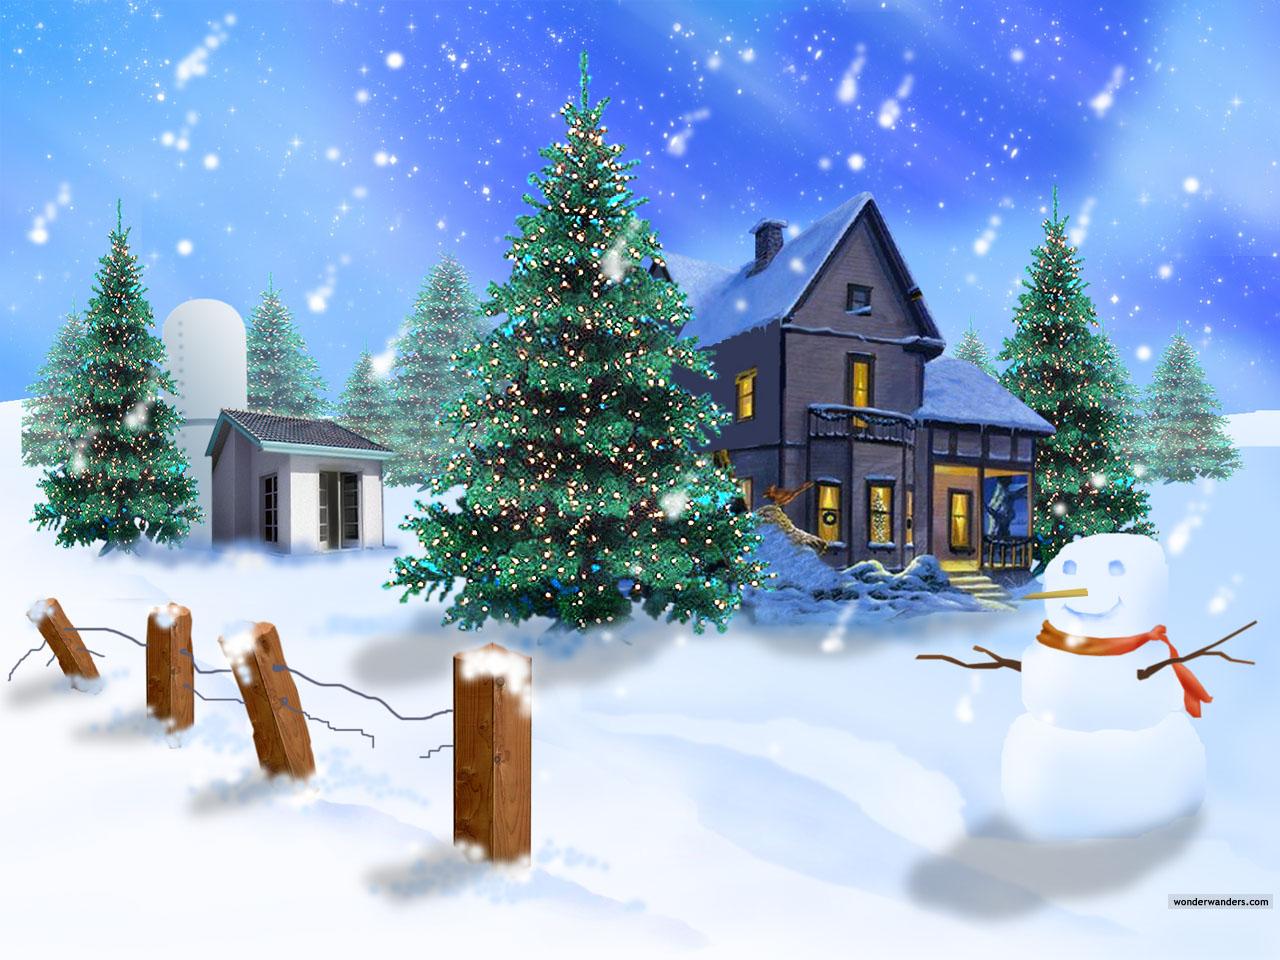 I was enjoying my Christmas wallpaper